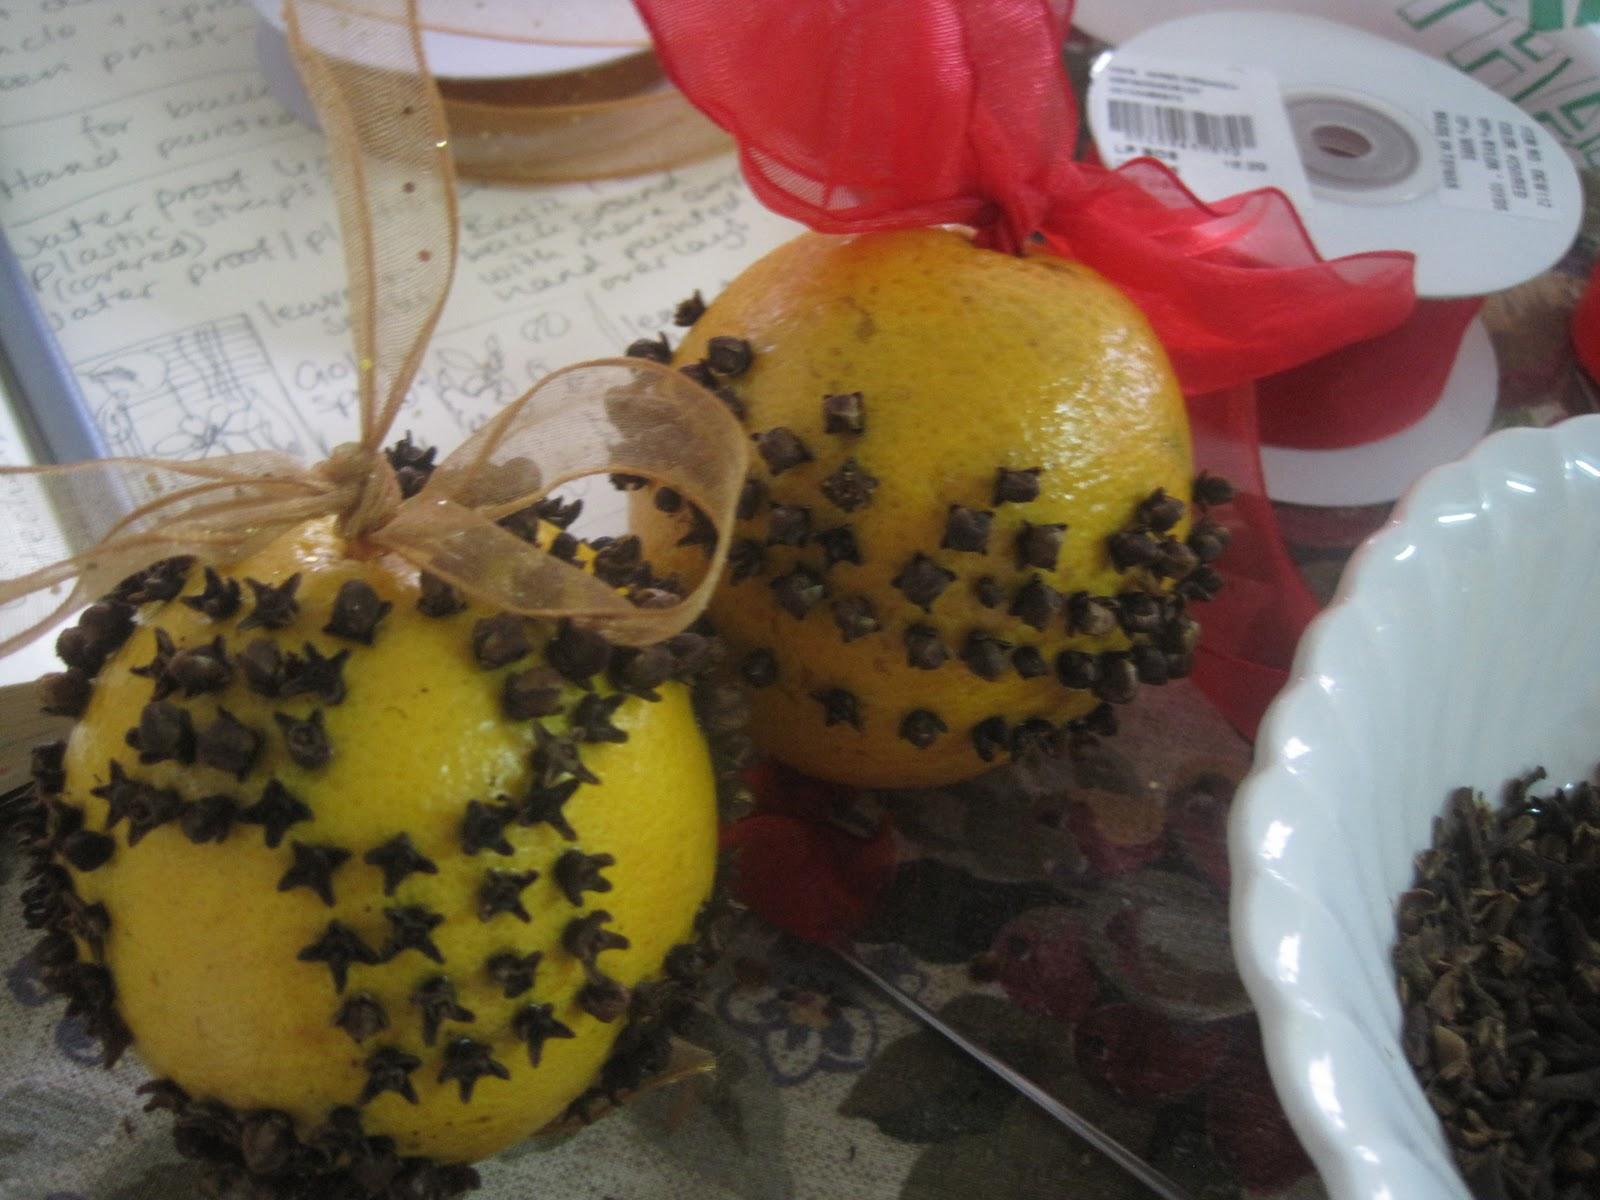 Aimee's Blog: Textiles & Other Ramblings: Orange & Clove